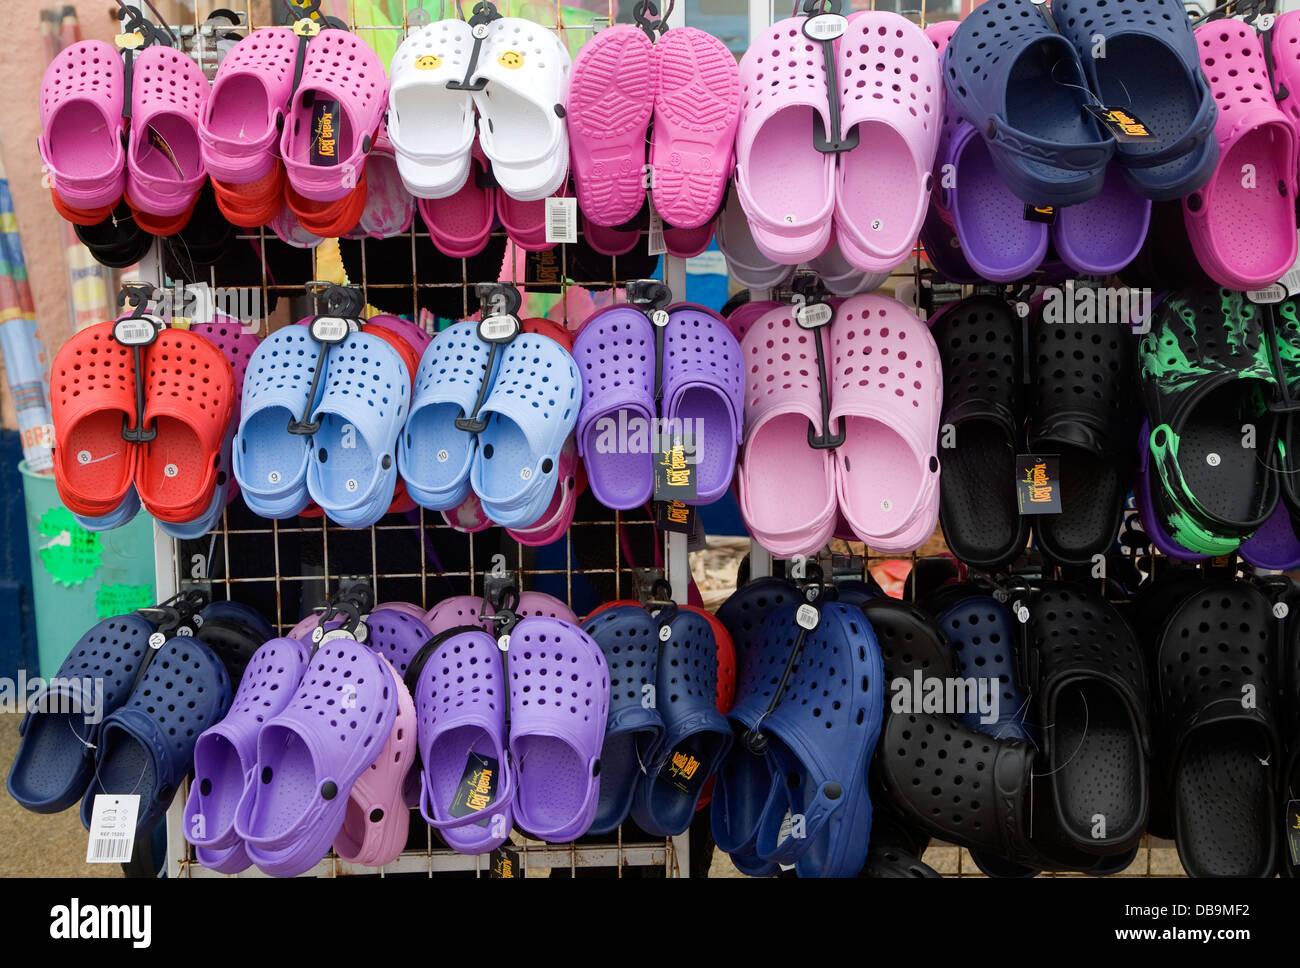 Plastic Croc shoes on display Cromer Norfolk England - Stock Image